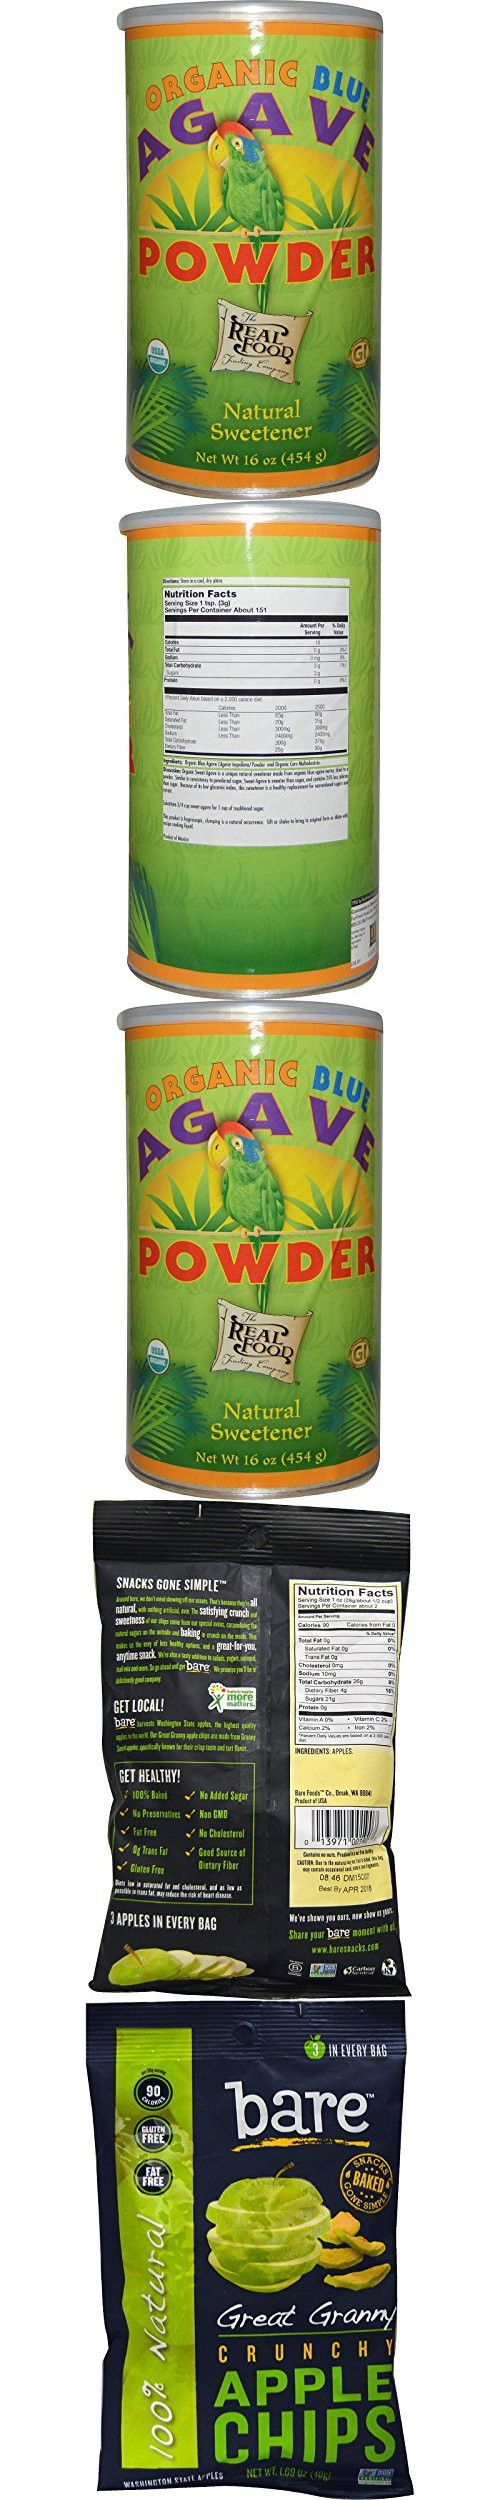 Best Fun Fresh Foods, The Real Food, Organic Blue Agave Powder, 16 oz (454 g), Bare Fruit, Great Granny Crunchy Apple Chips, 1.69 oz (48 g)